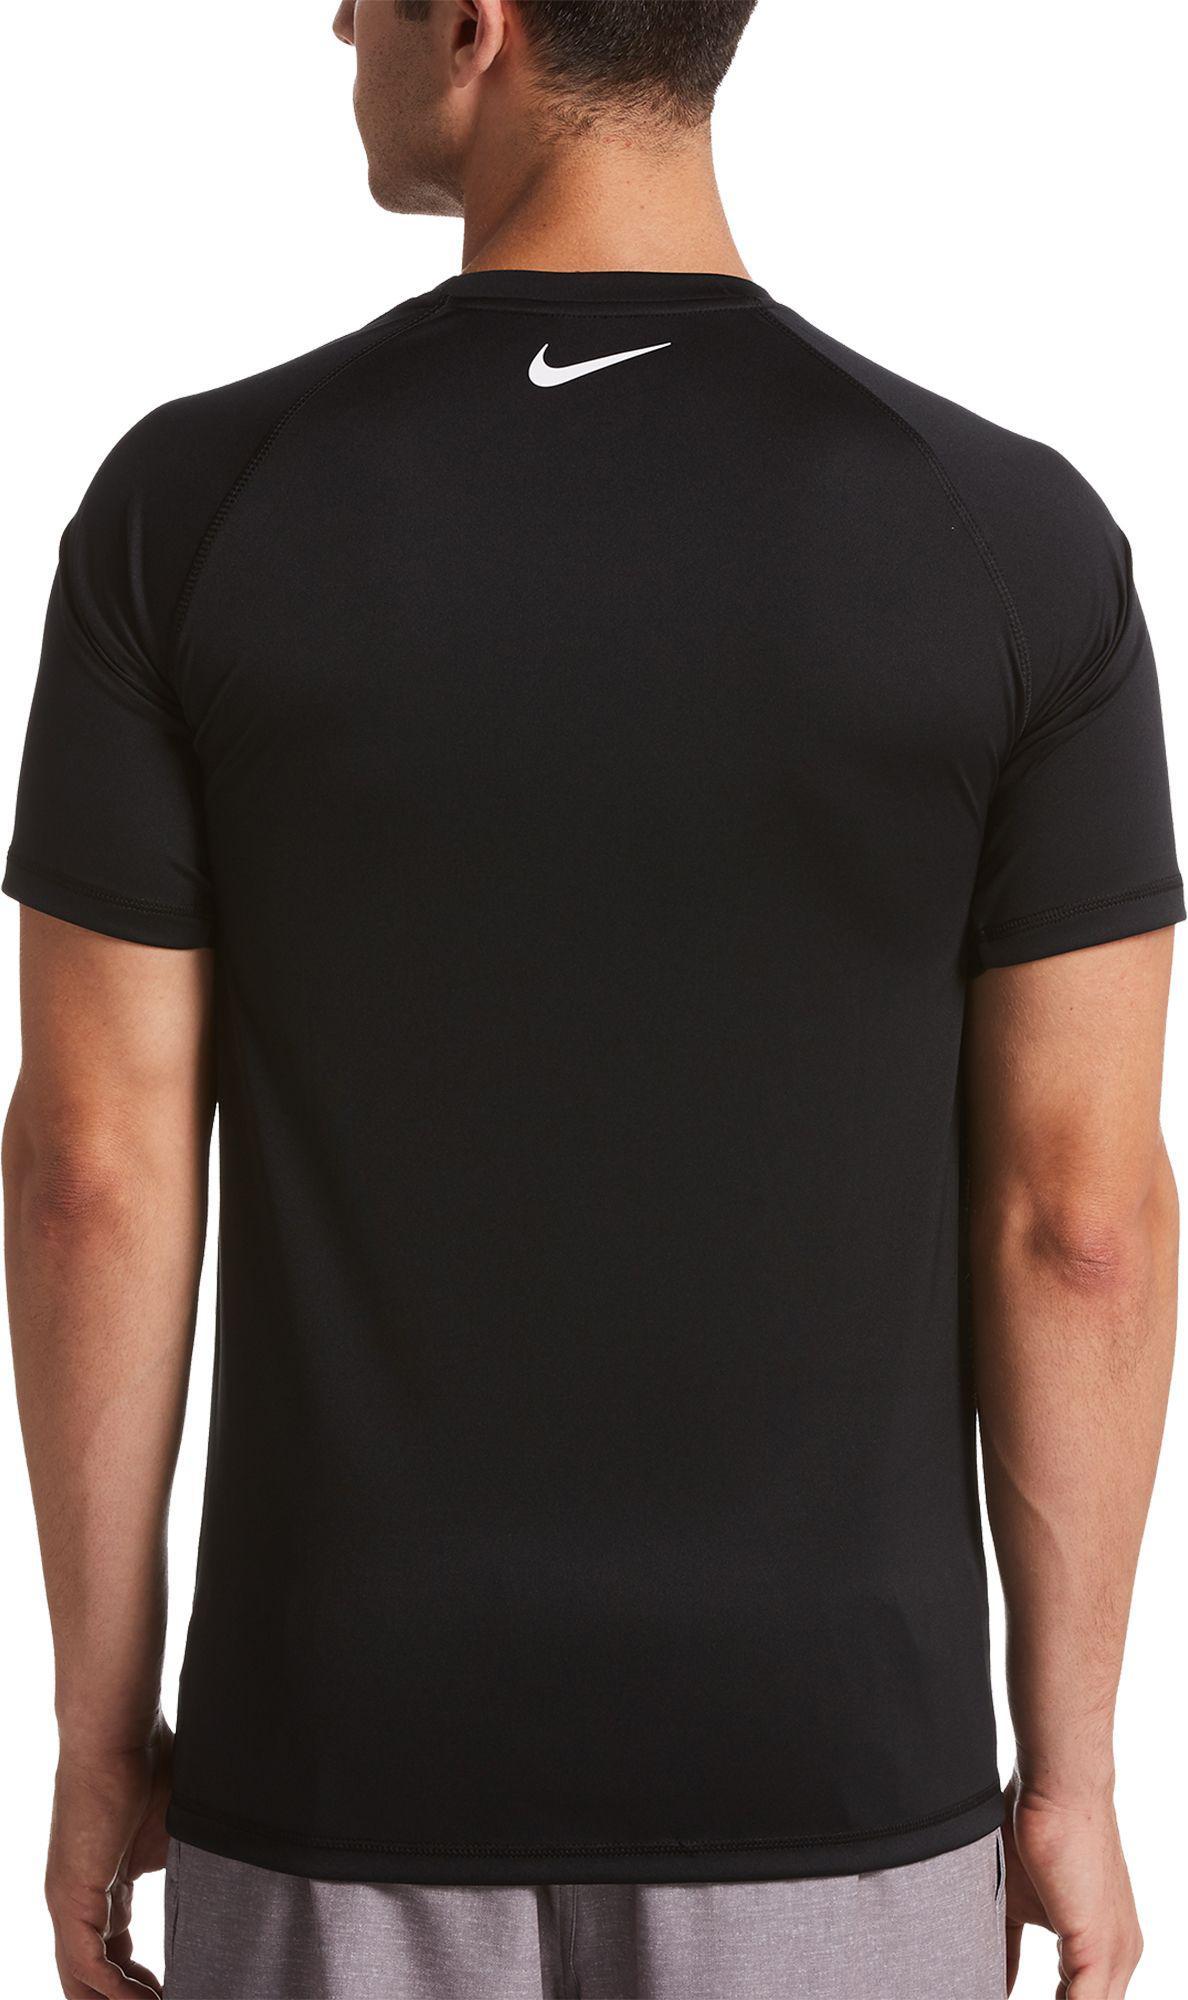 ca19ab52b Nike - Black Rift Short Sleeve Rash Guard for Men - Lyst. View fullscreen